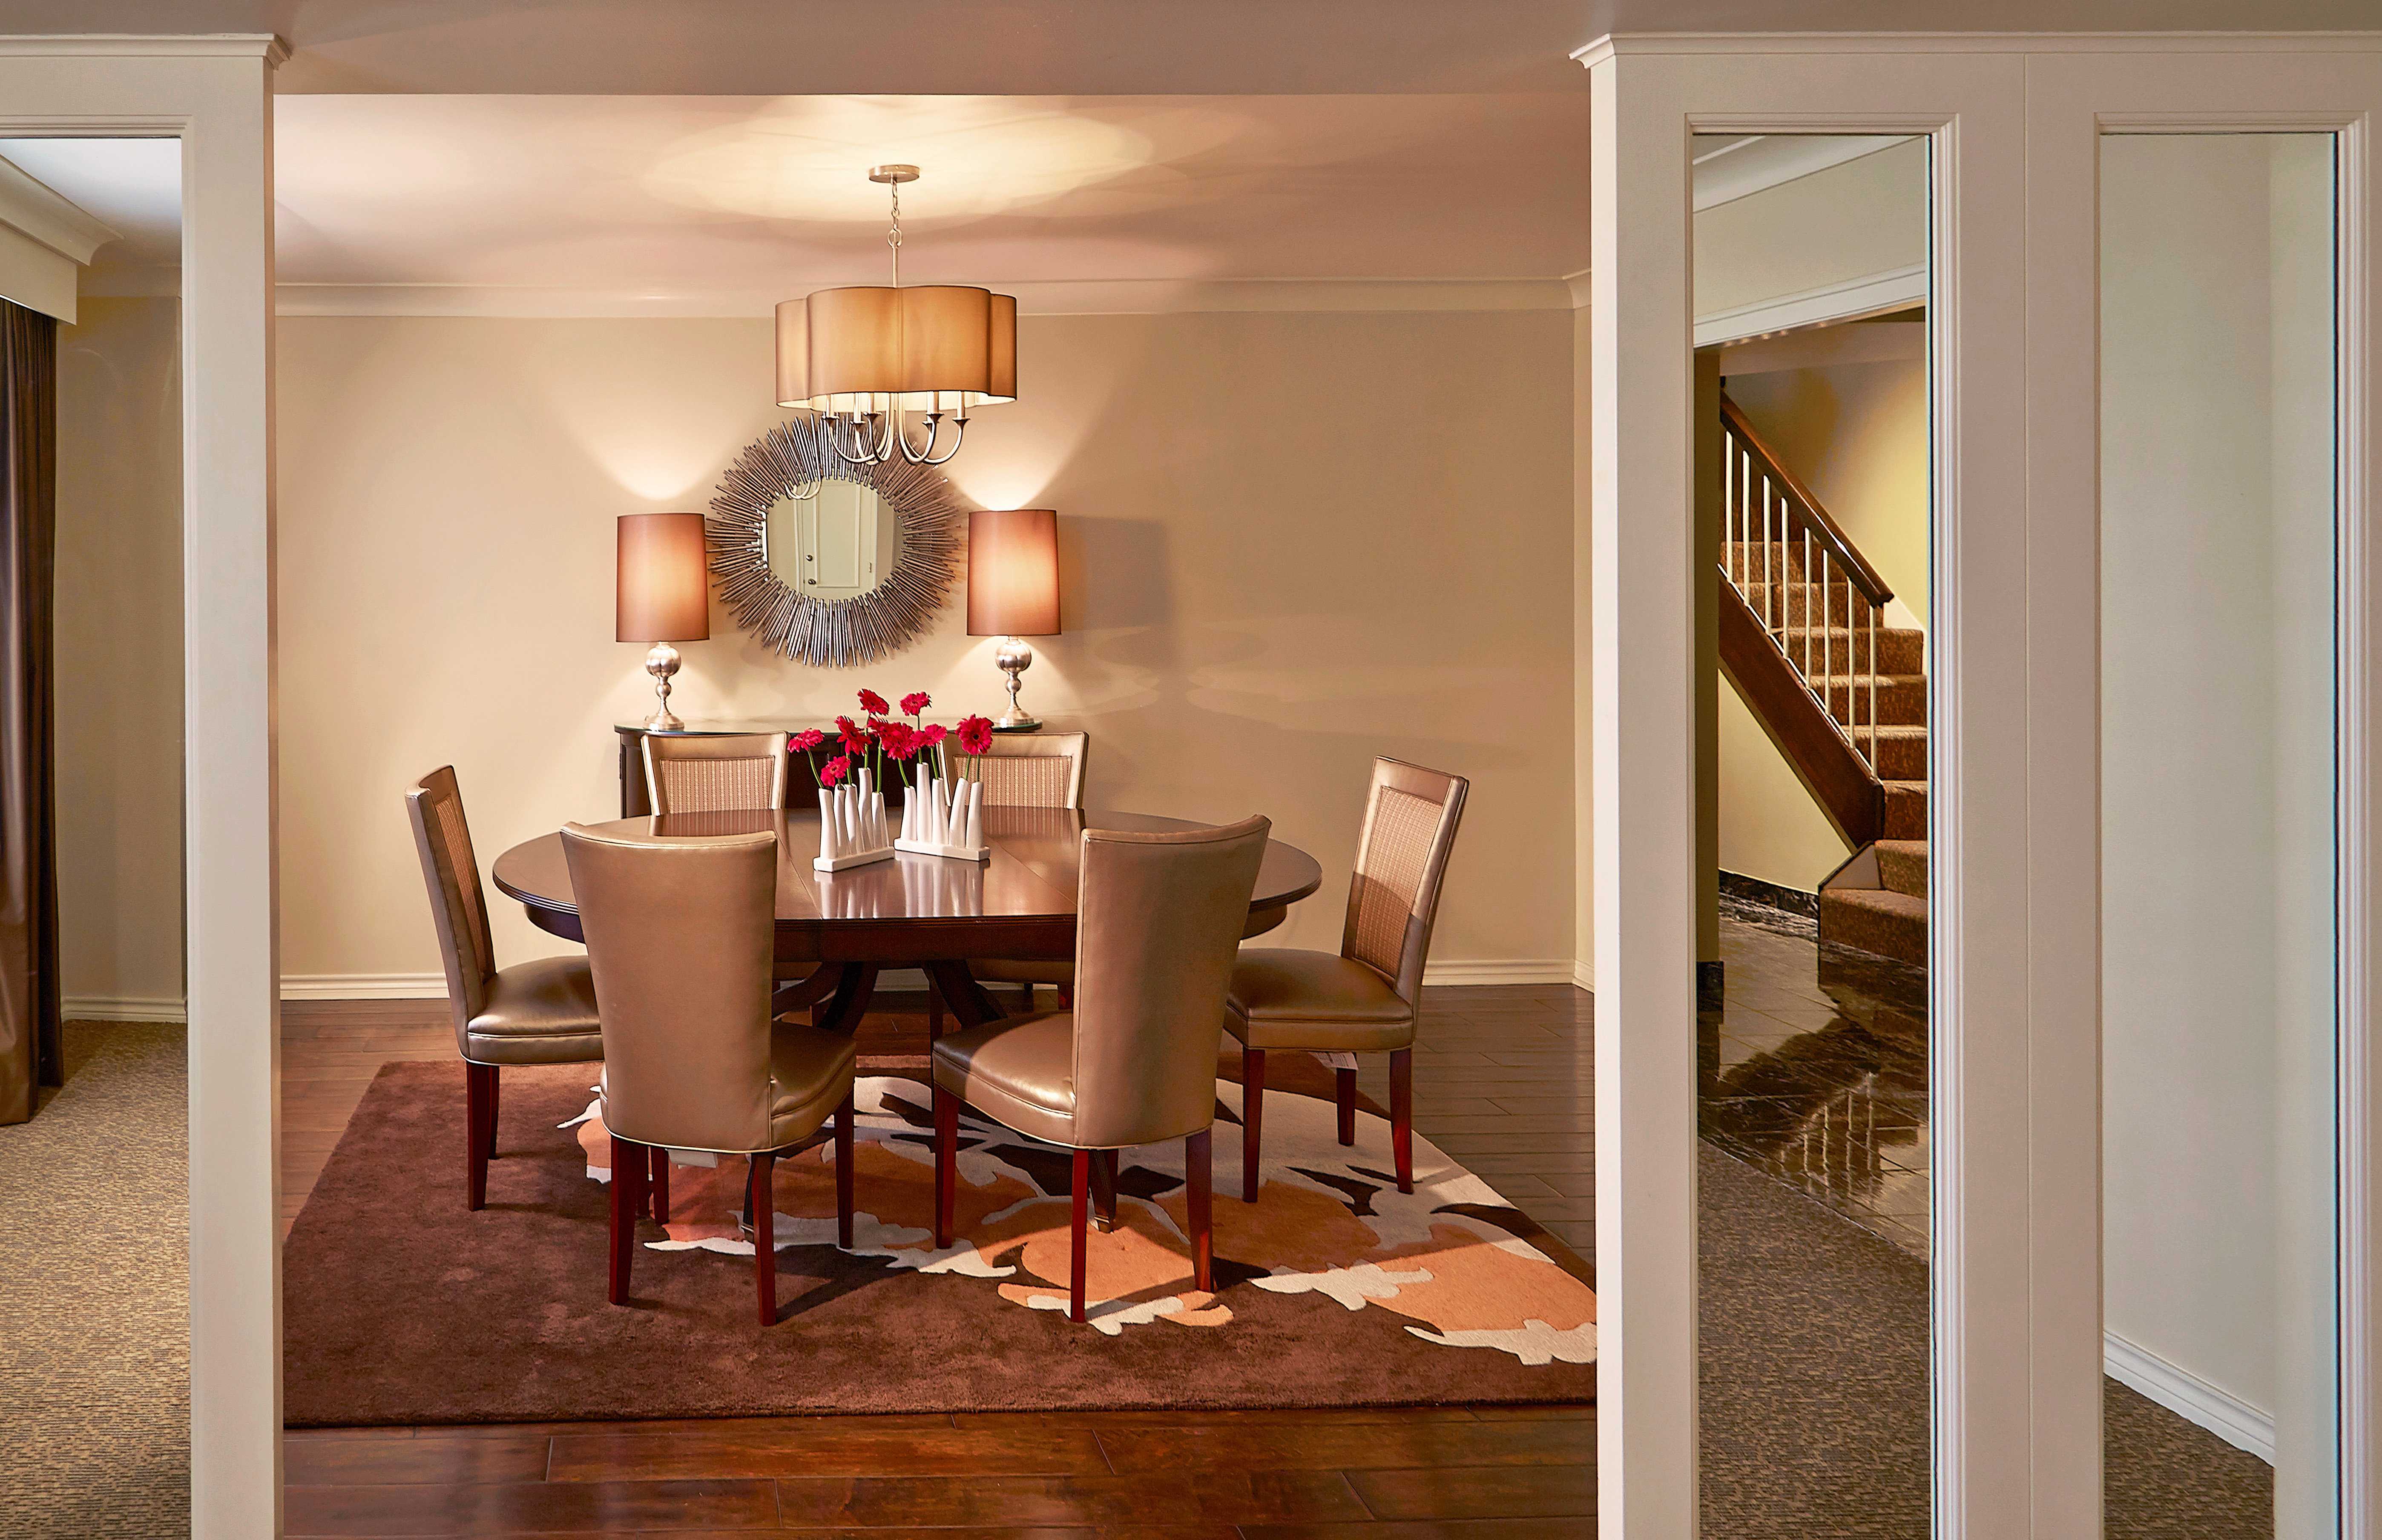 Classic Resort chair living room home cabinetry hardwood Bedroom